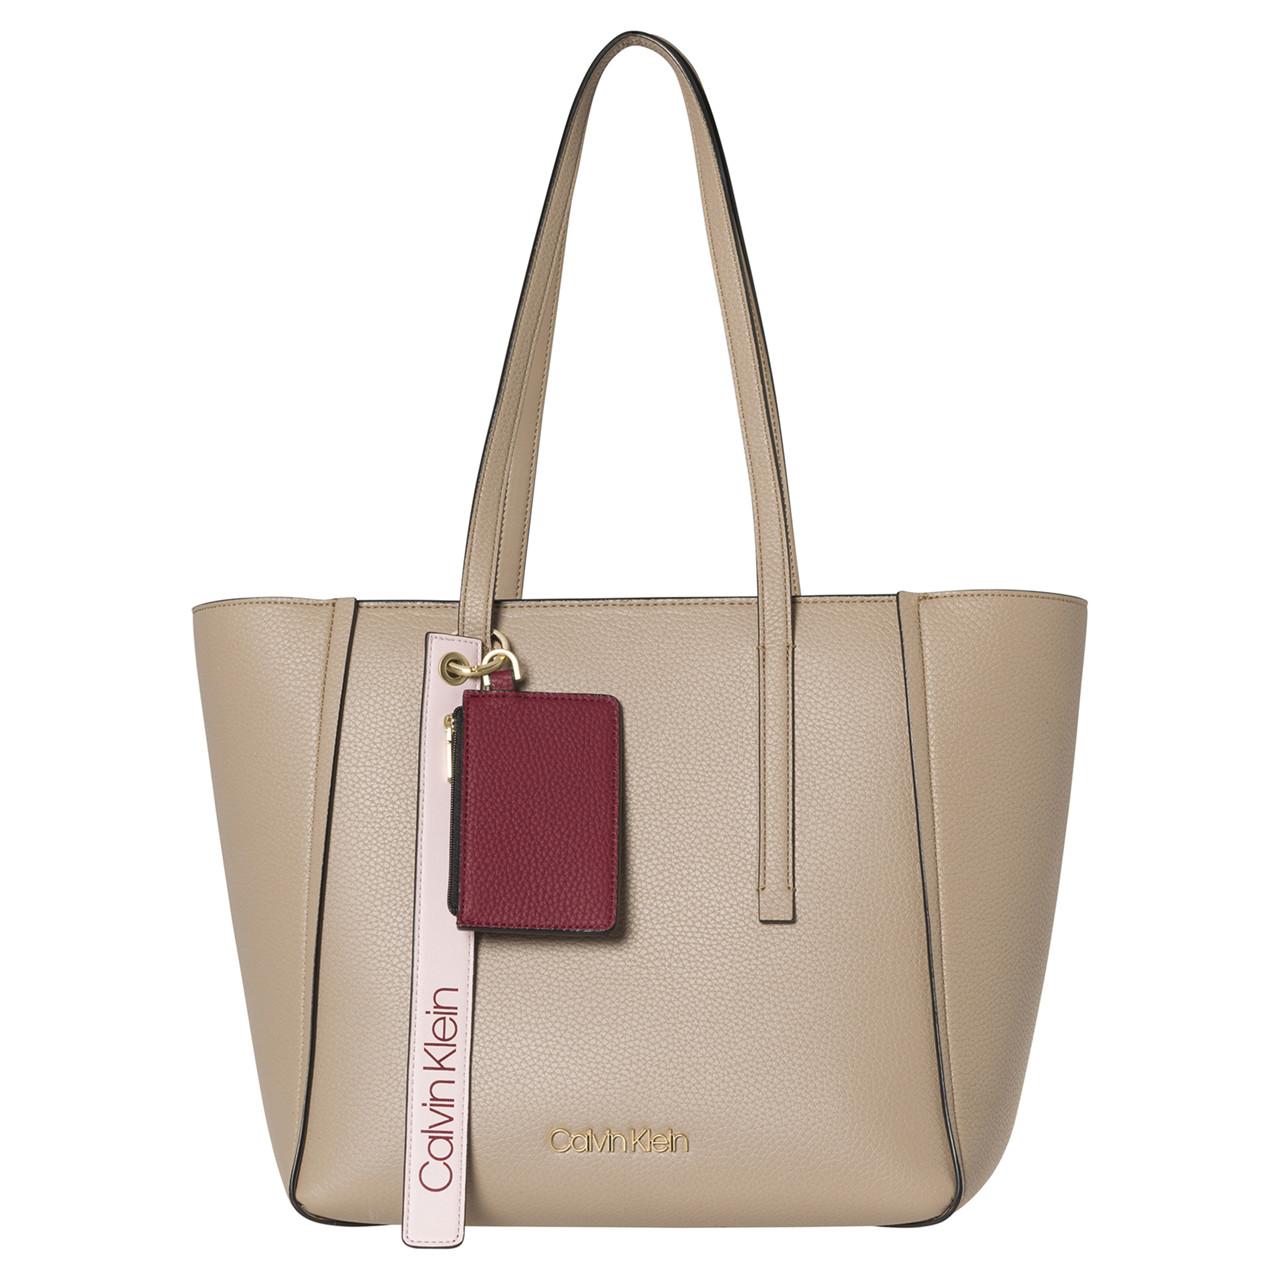 Ck Base Medium shopper fra Calvin Klein 4f9df44533b